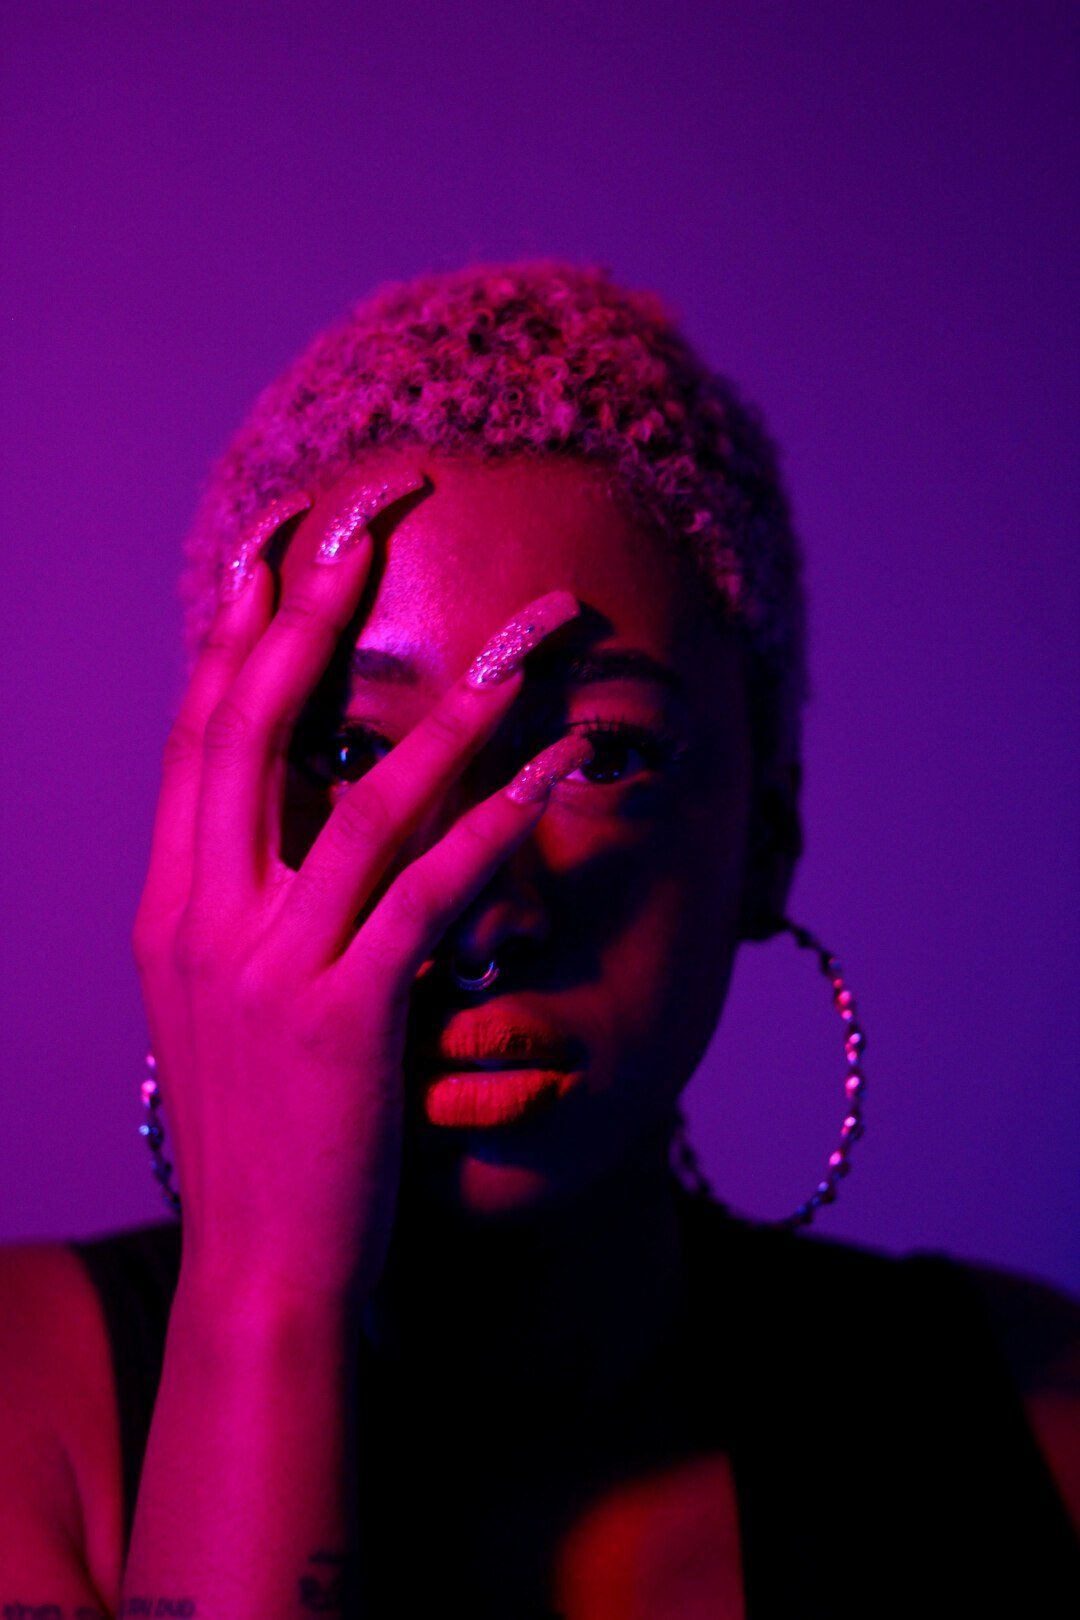 Raych Jackson Issuu In 2020 Photography Black Girl Magic Light Photography